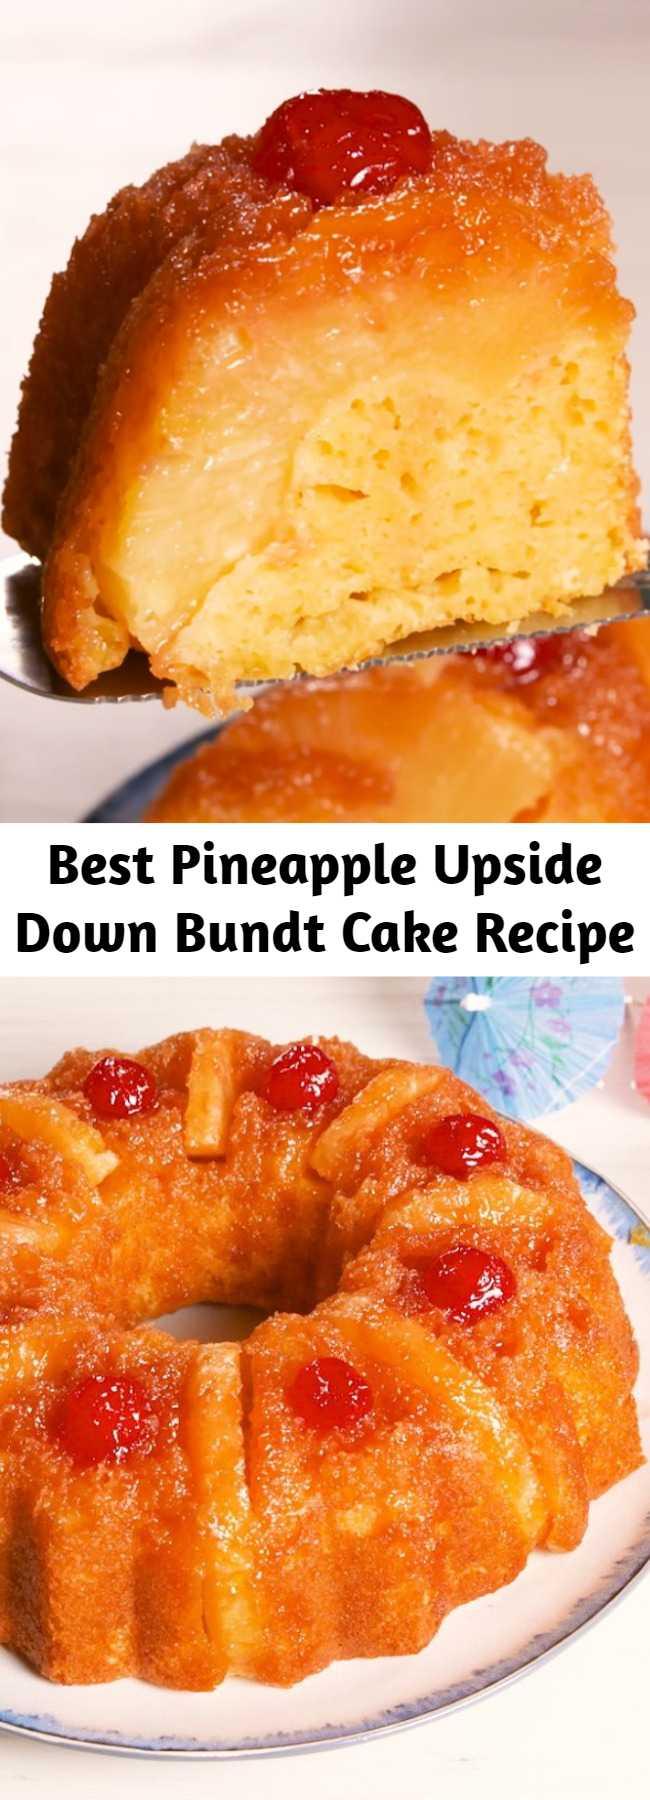 Best Pineapple Upside Down Bundt Cake Recipe - This Pineapple Upside Down Bundt Cake tastes like vacation. Stunning. #pineapple #upsidedowncake #pineapplecake #pineapplejuice #cherries #summertreat